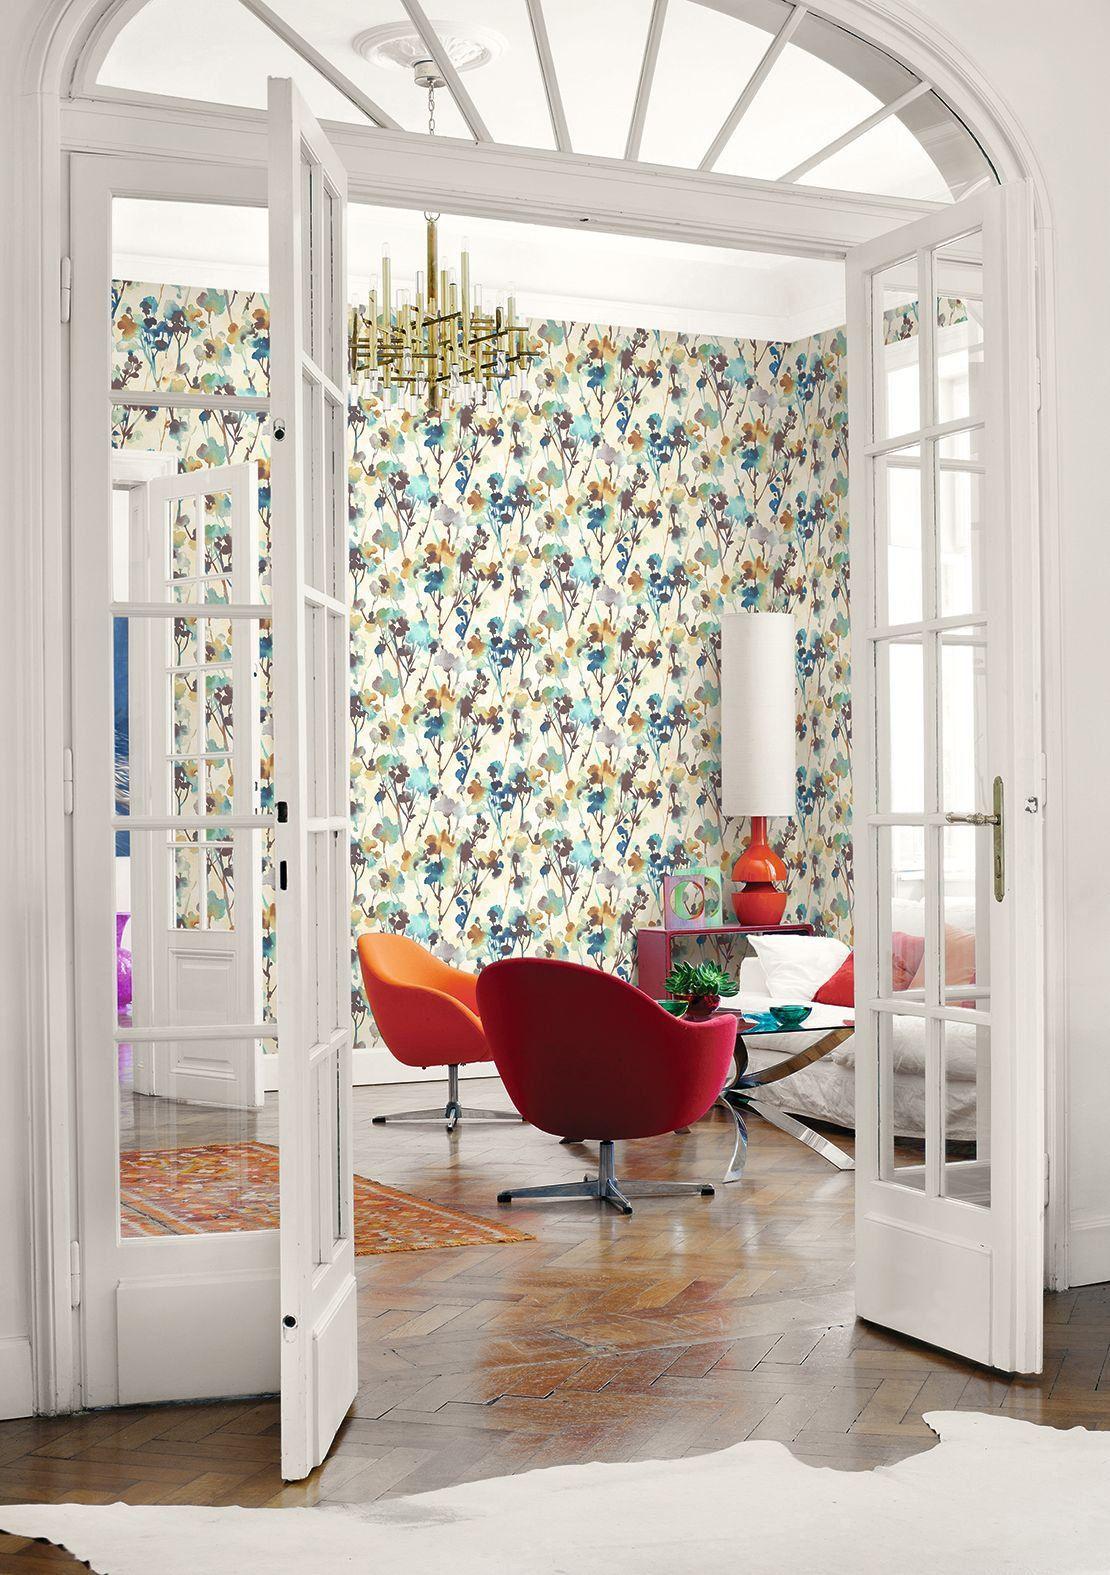 Home interior tapeten design Обои seabrook lugano lg  Идеи для гостиной  pinterest  lugano